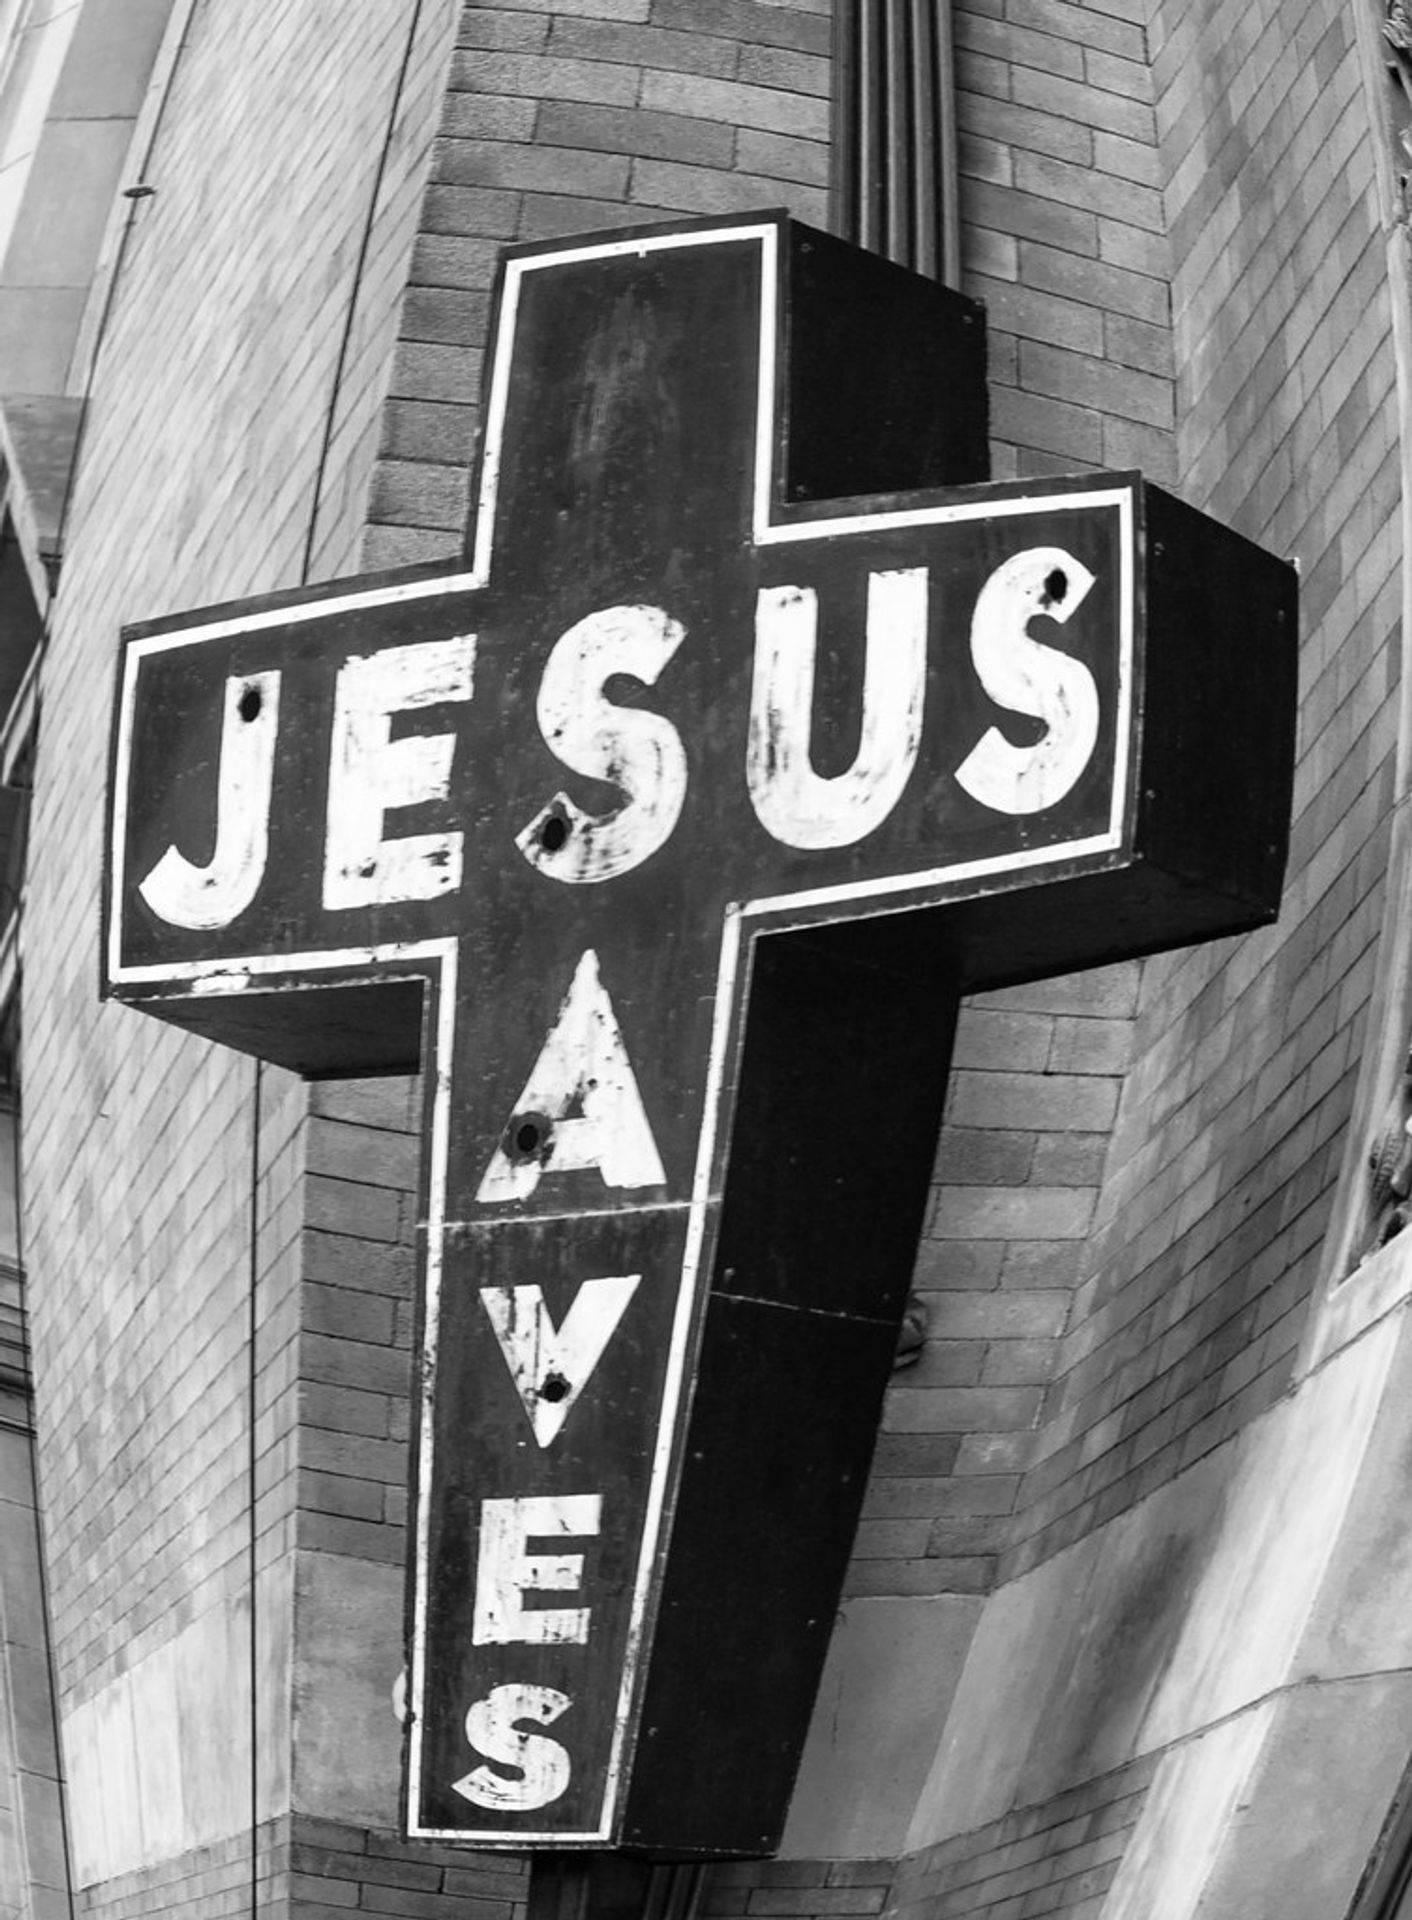 Jesus saves, come experience Him